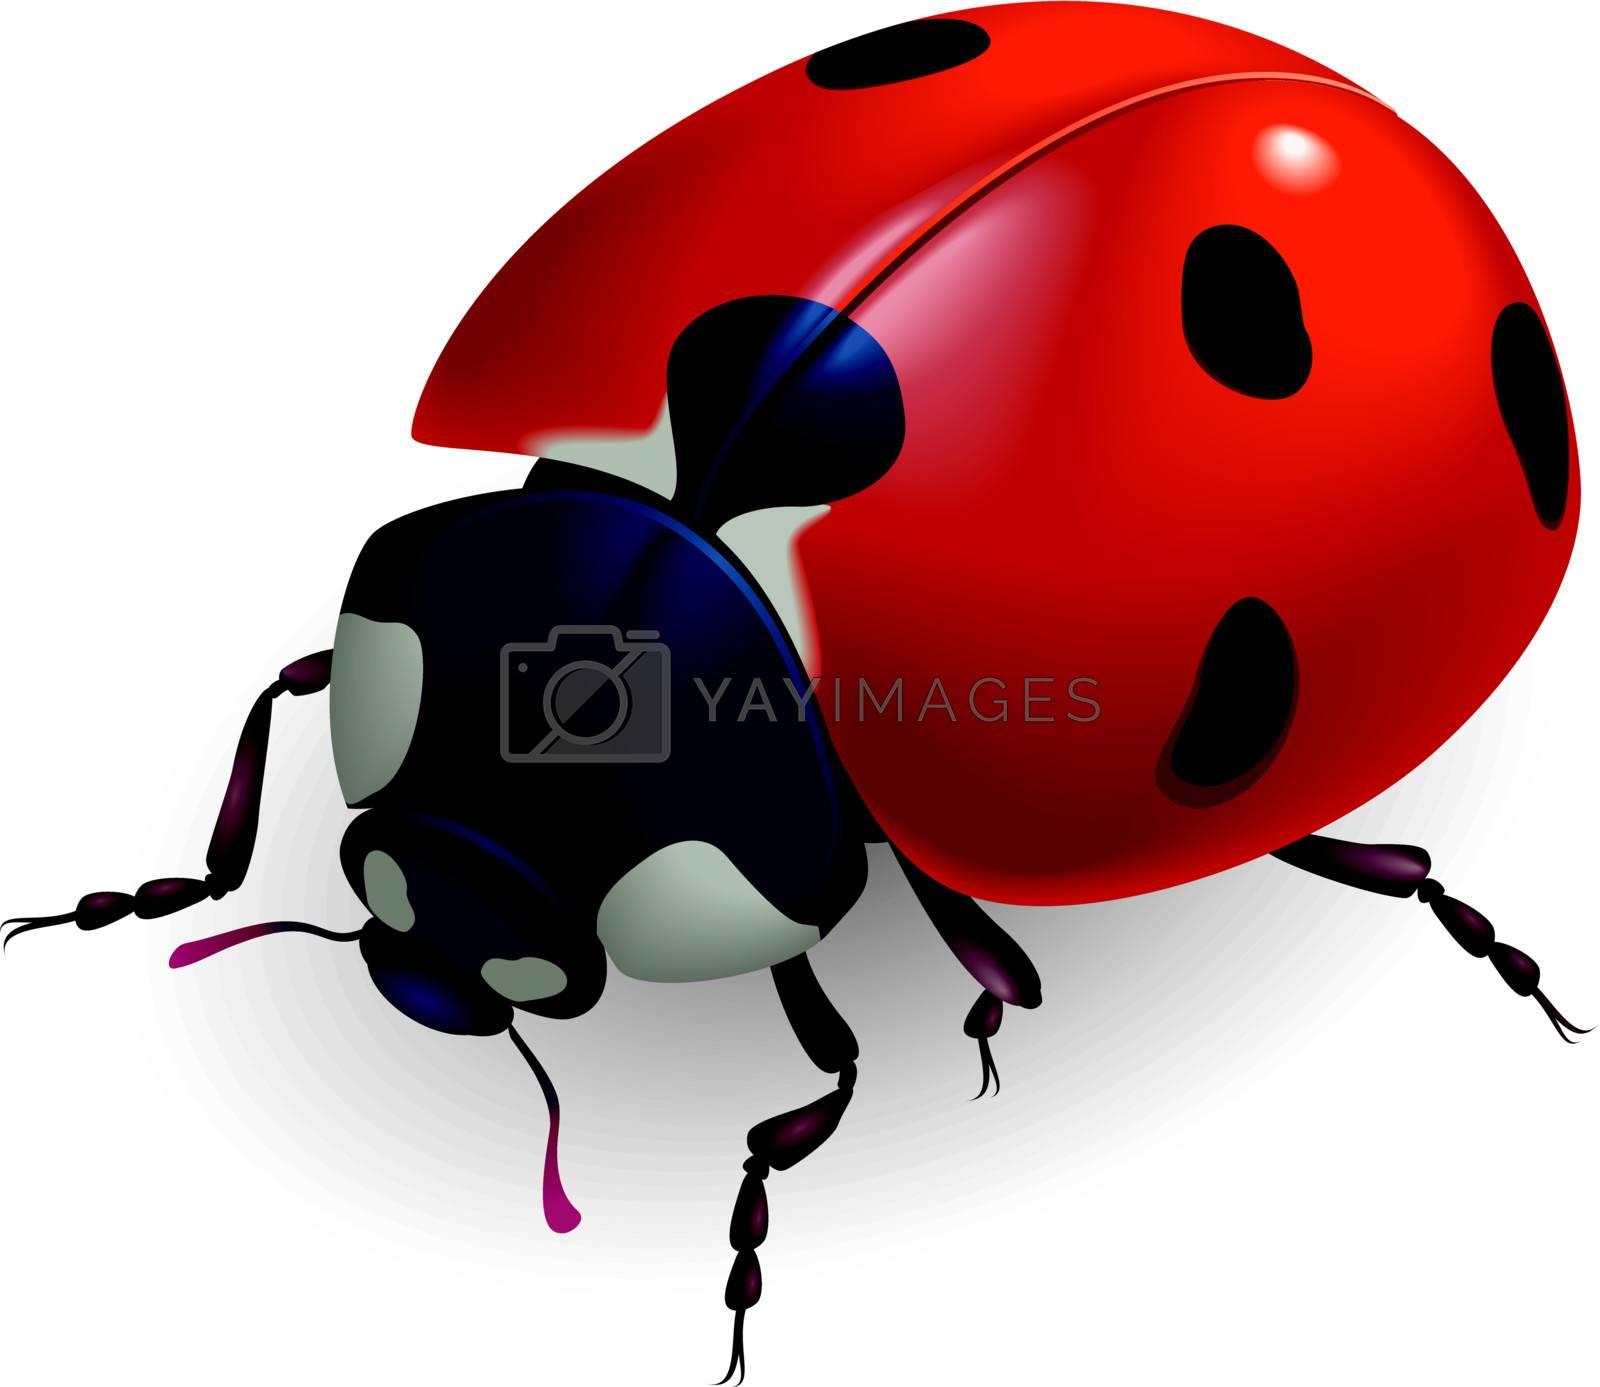 Ladybug. (Lat. Coccinellidae) Vector illustration.